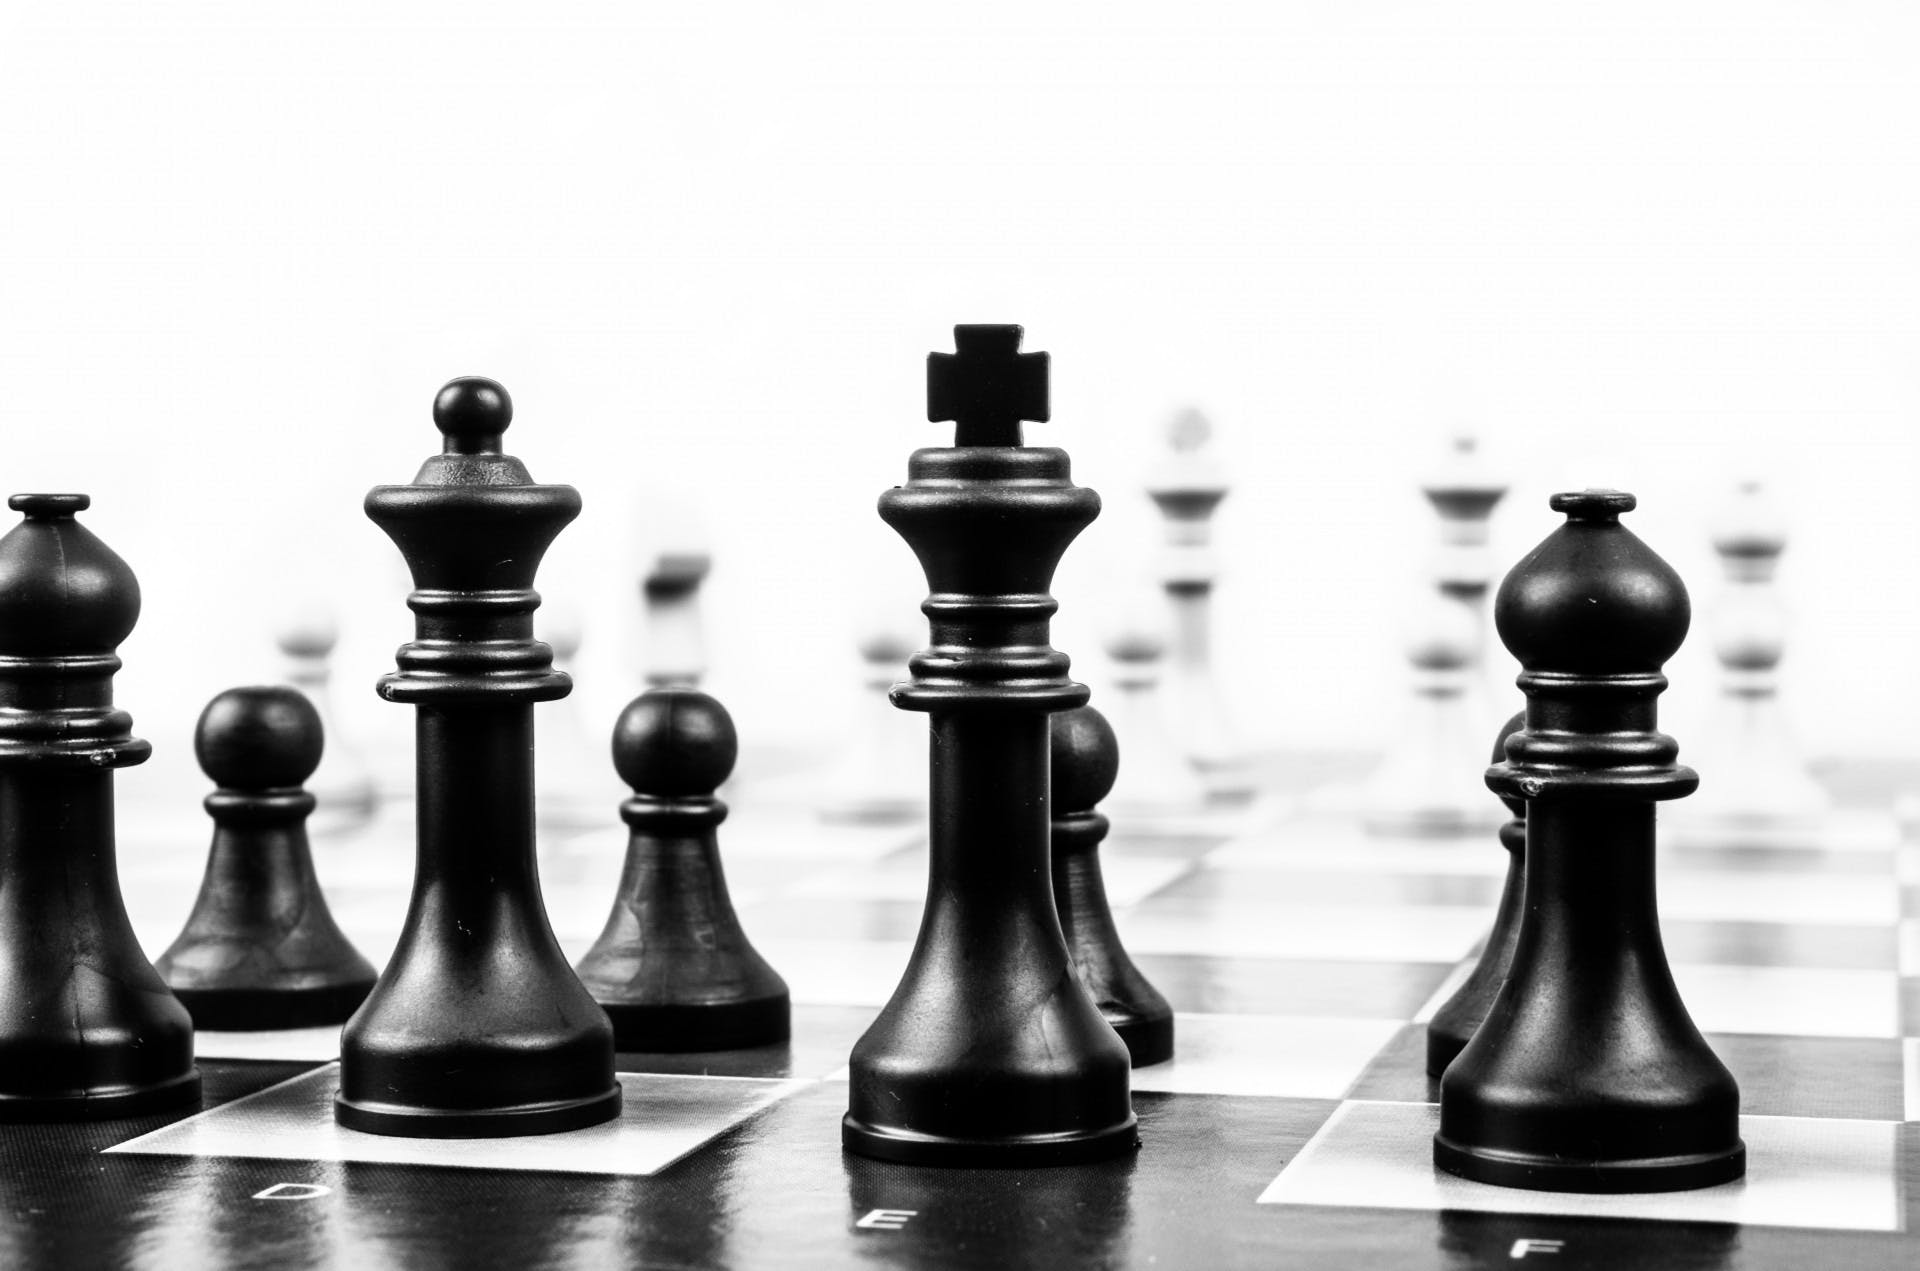 Wooden Black Chess Piece